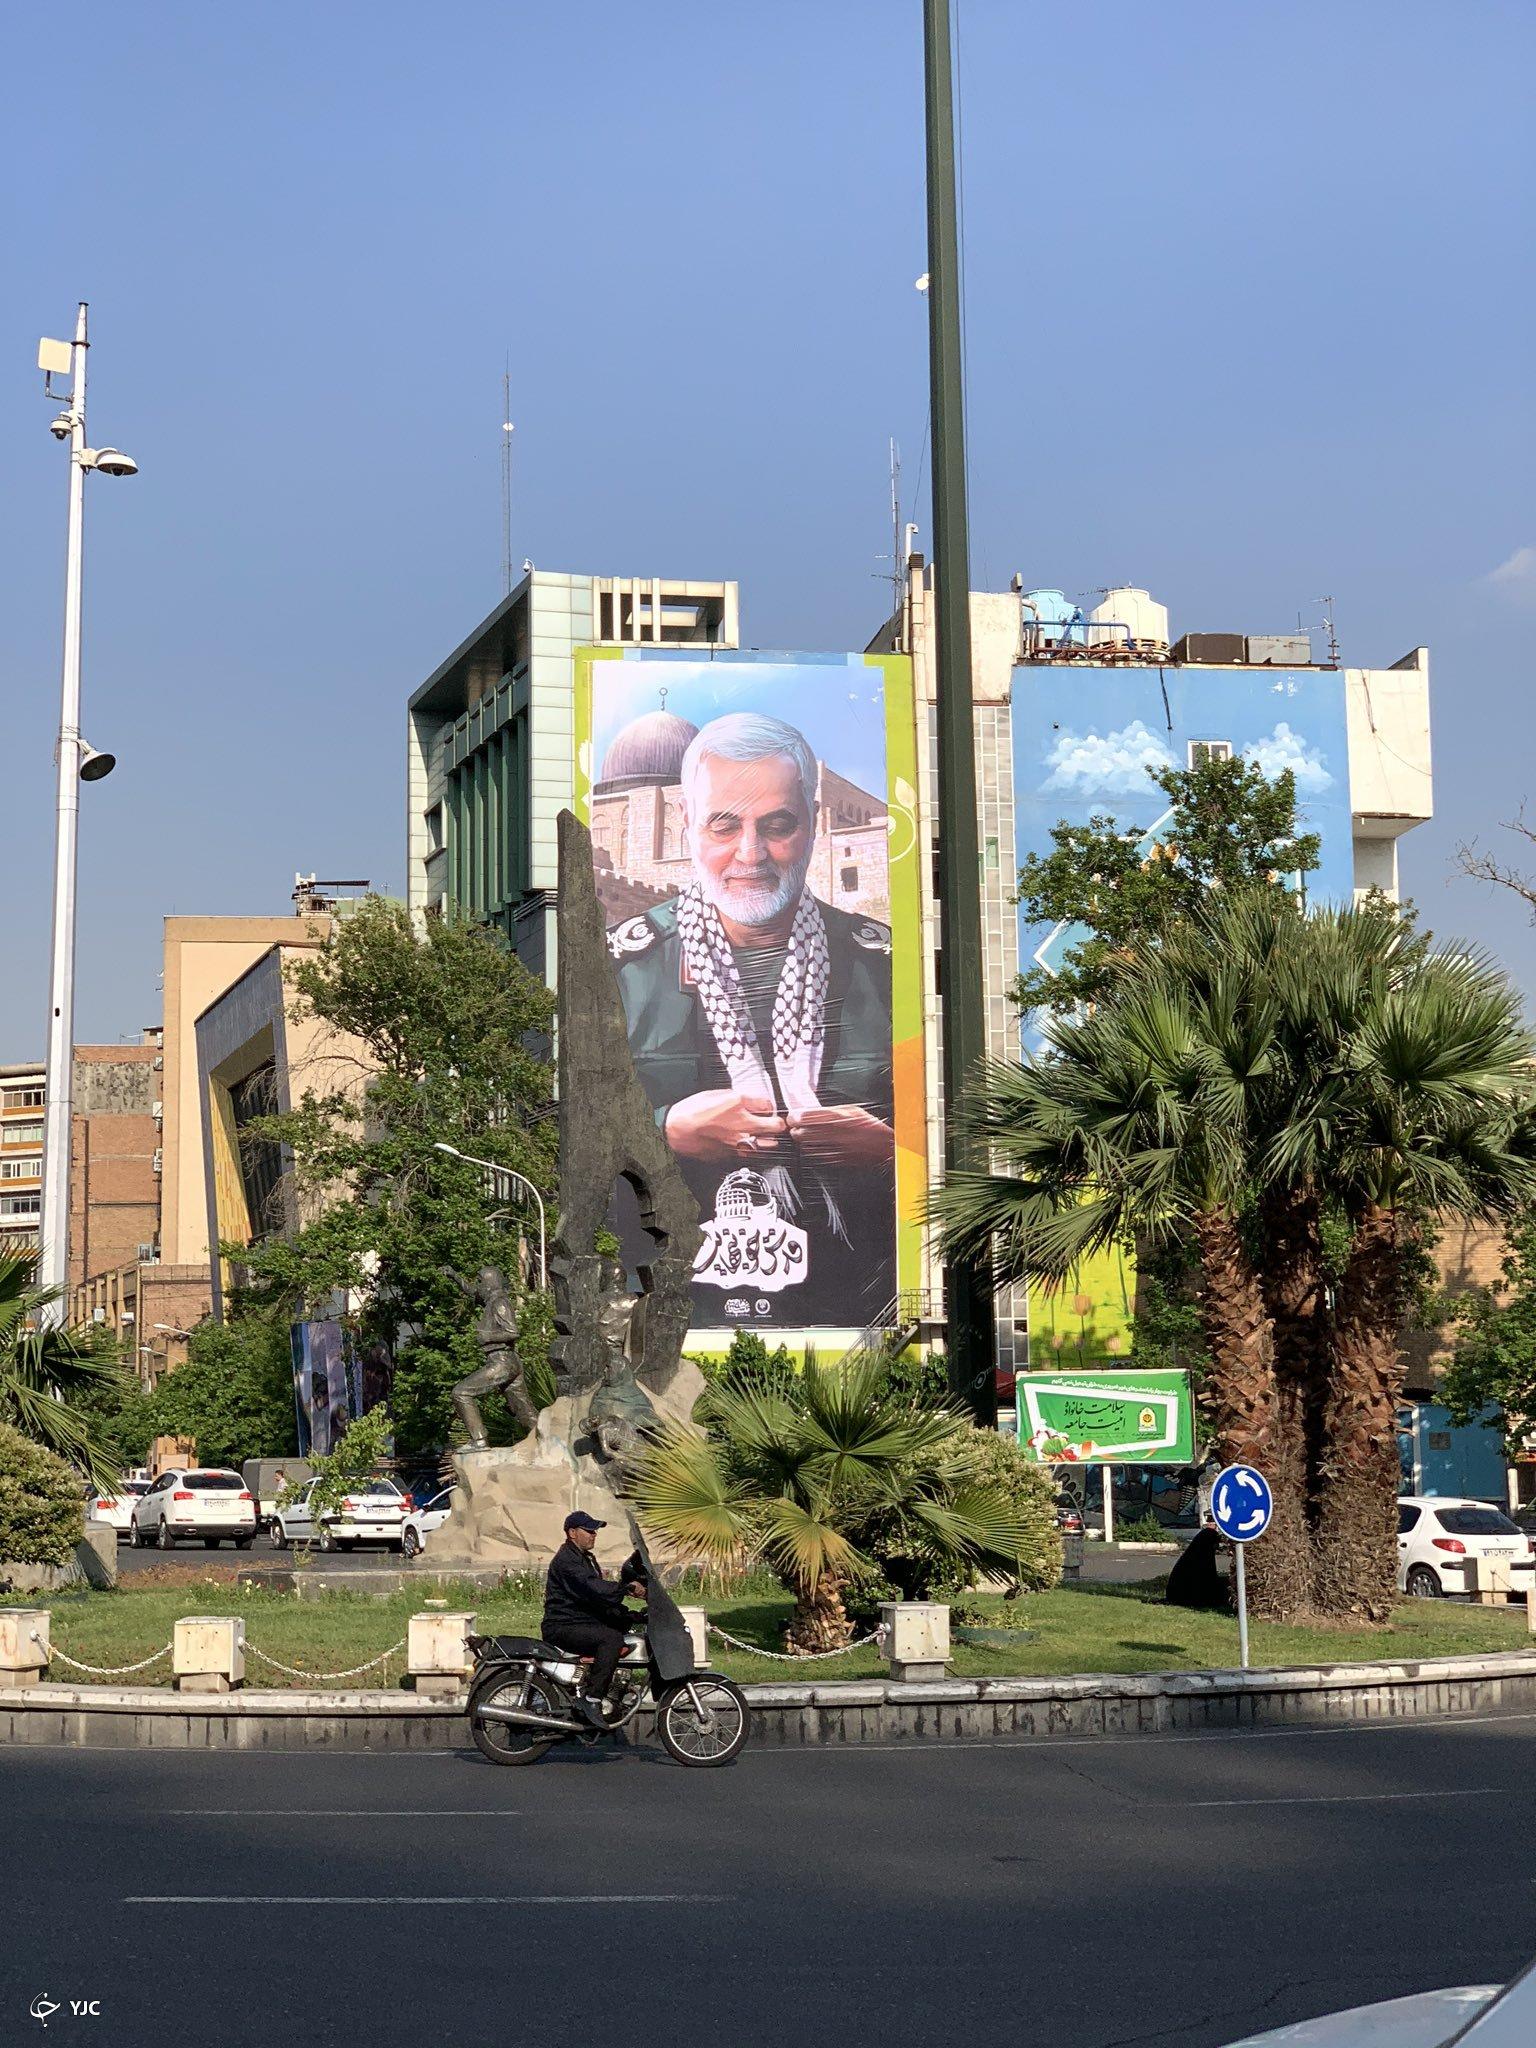 حاج قاسم سلیمانی در فلسطین +عکس